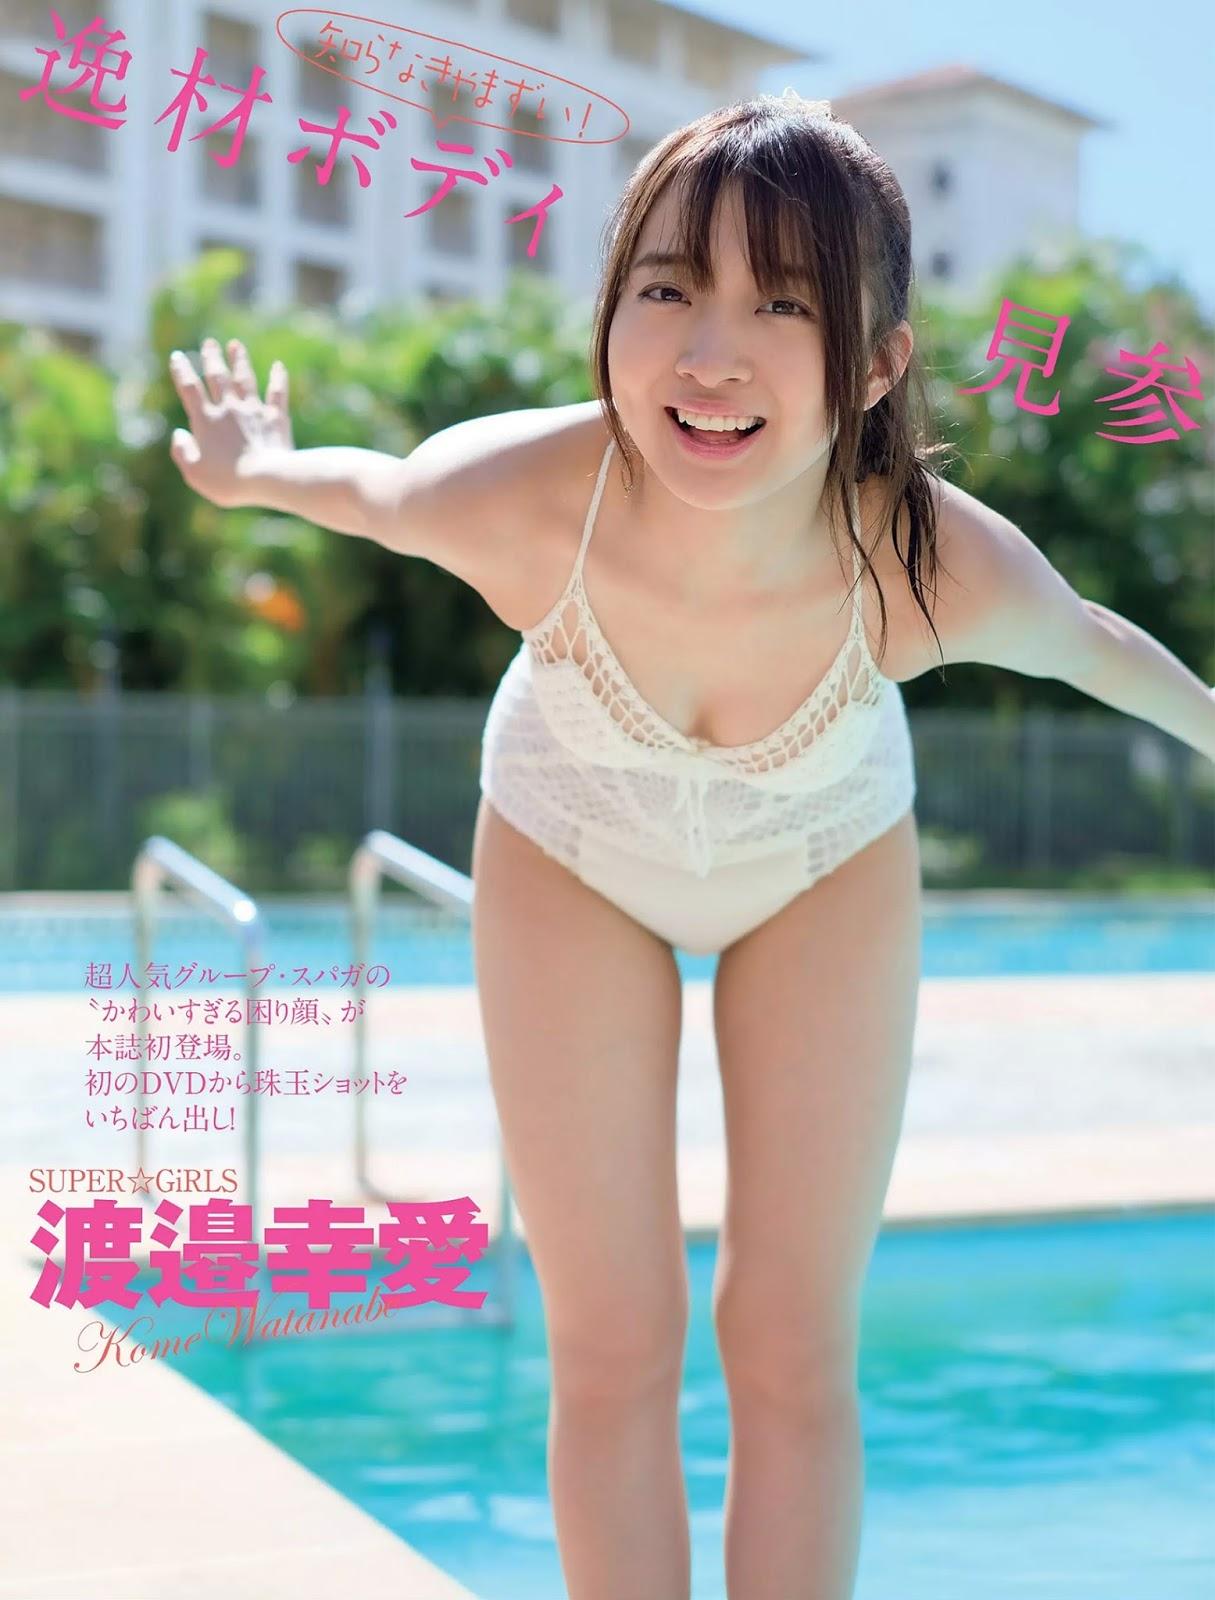 Watanabe Koume 渡邉幸愛, FLASH 2018.04.24 (フラッシュ 2018年4月24日号)